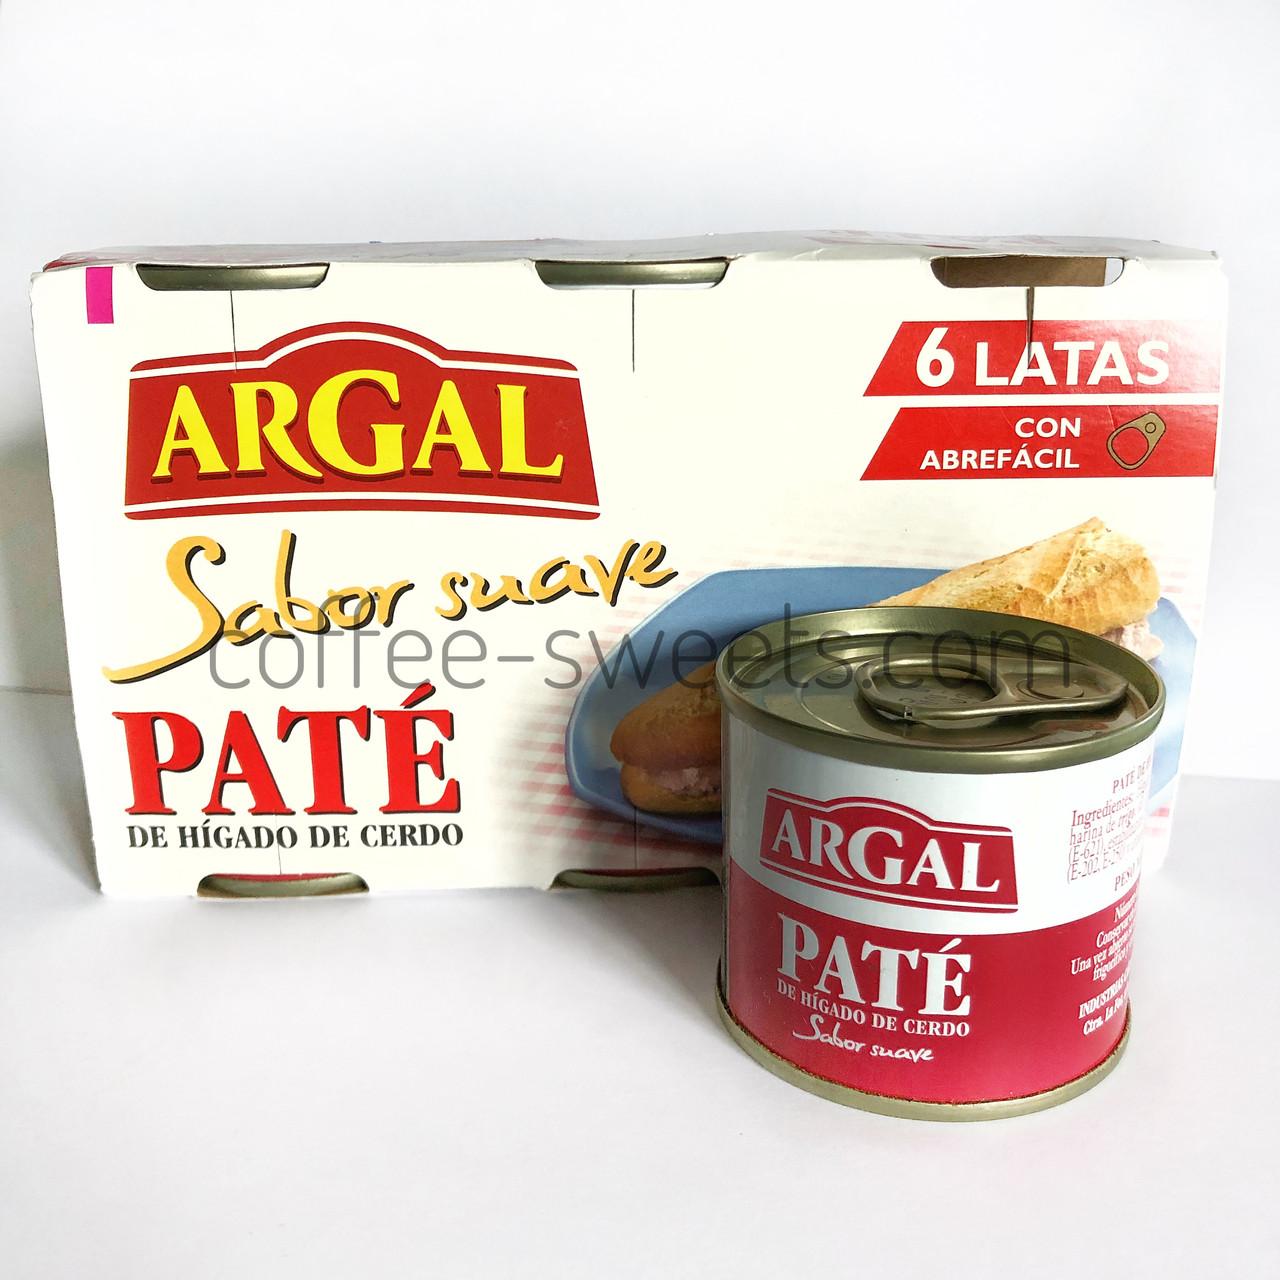 Паштет из свинной Argal Sabor suave Pate 6*83 g